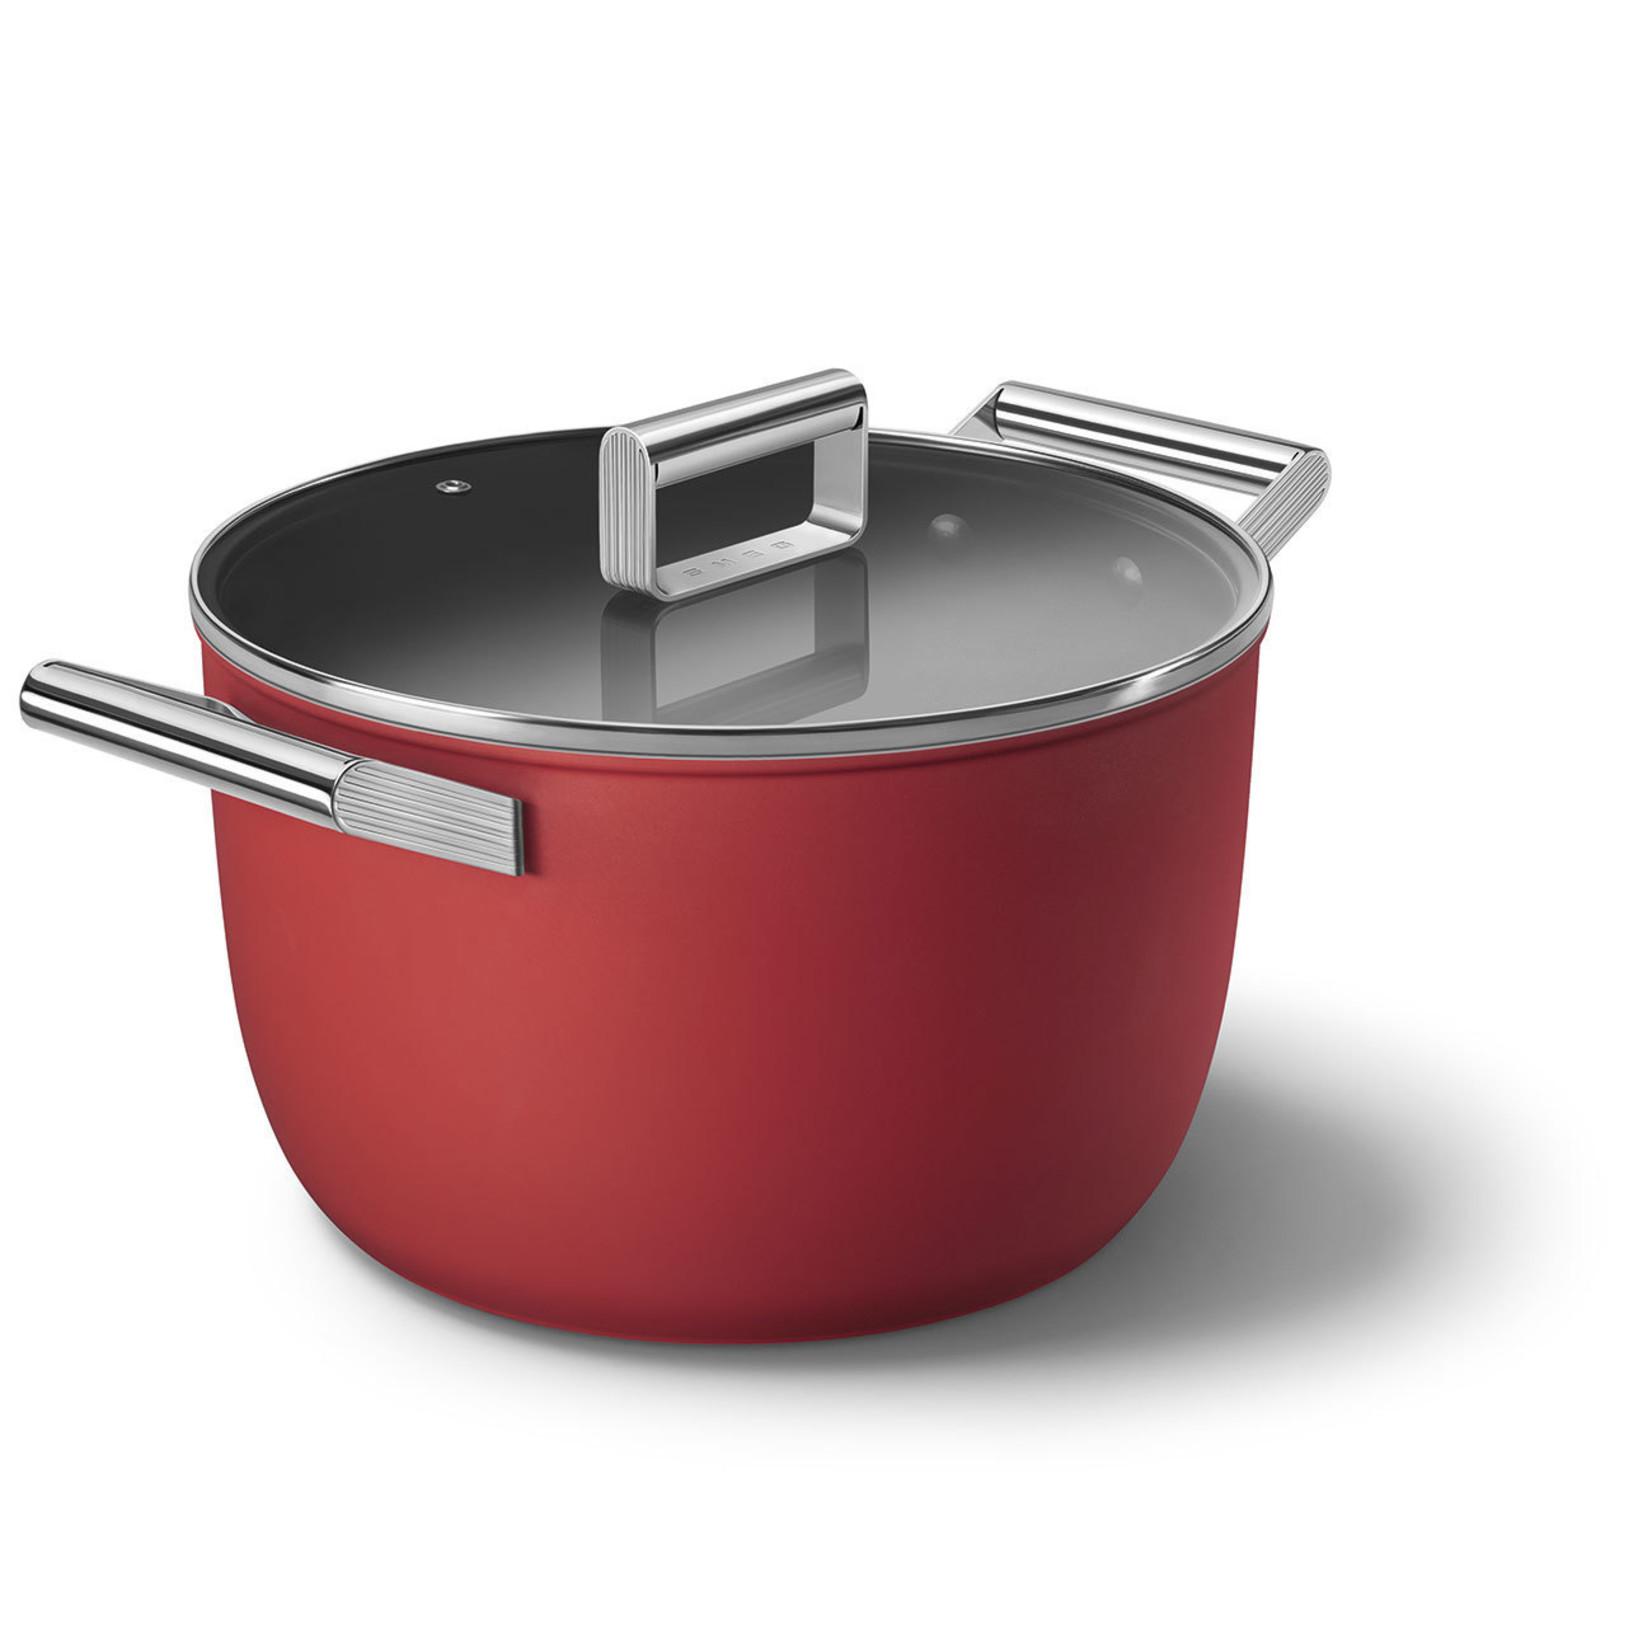 Smeg SMEG Kookpan met deksel 26 cm, anti-aanbaklaag, rood mat